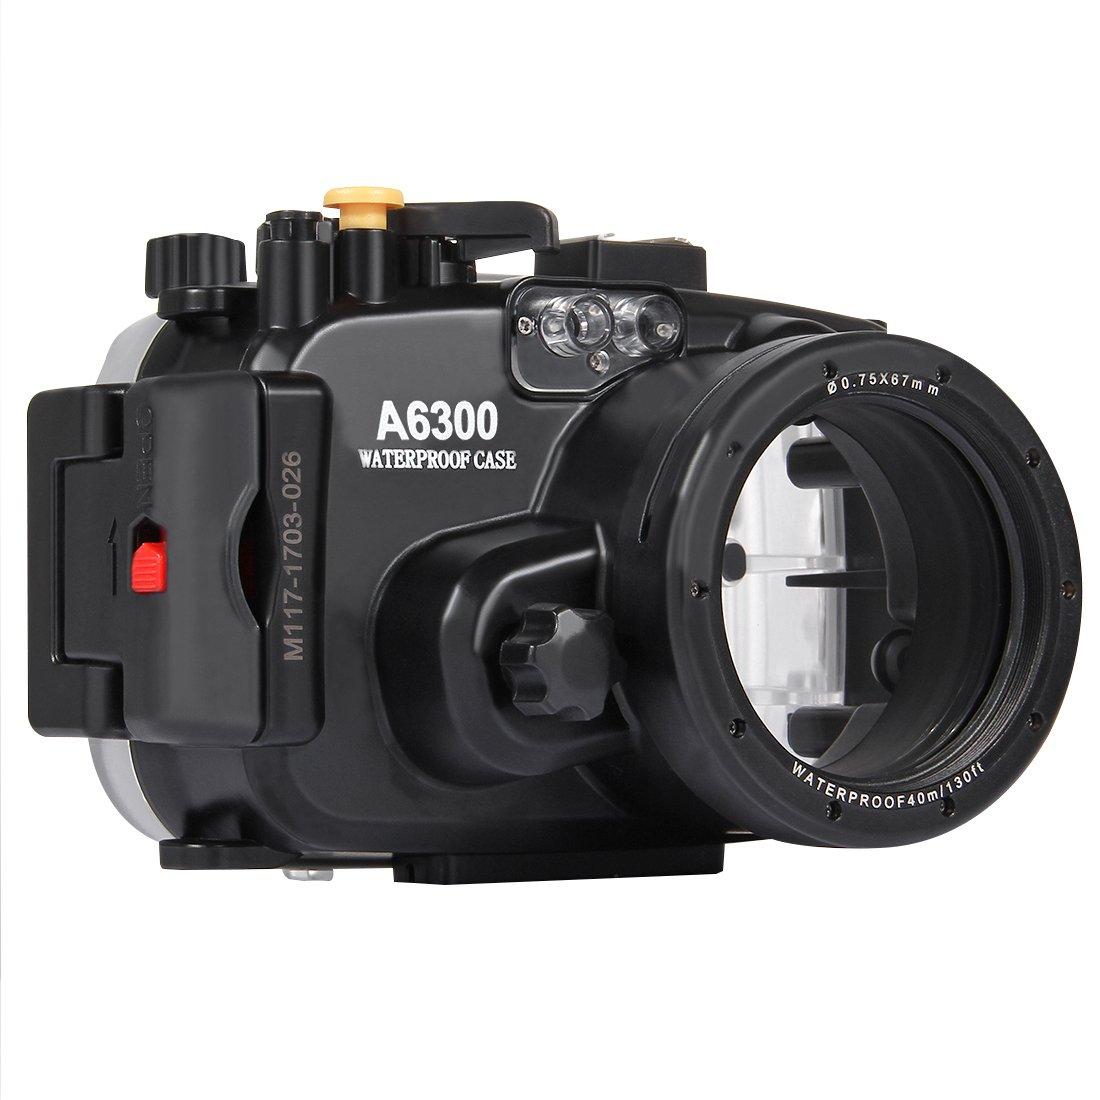 YAOkxin Sony A6300 40m水中深度ダイビングケース 防水カメラハウジング プロフェッショナル水中写真防水カバー(E PZ 16-50mm F3.5-5.6 OSS)(ブラック)   B07MKFXWVH